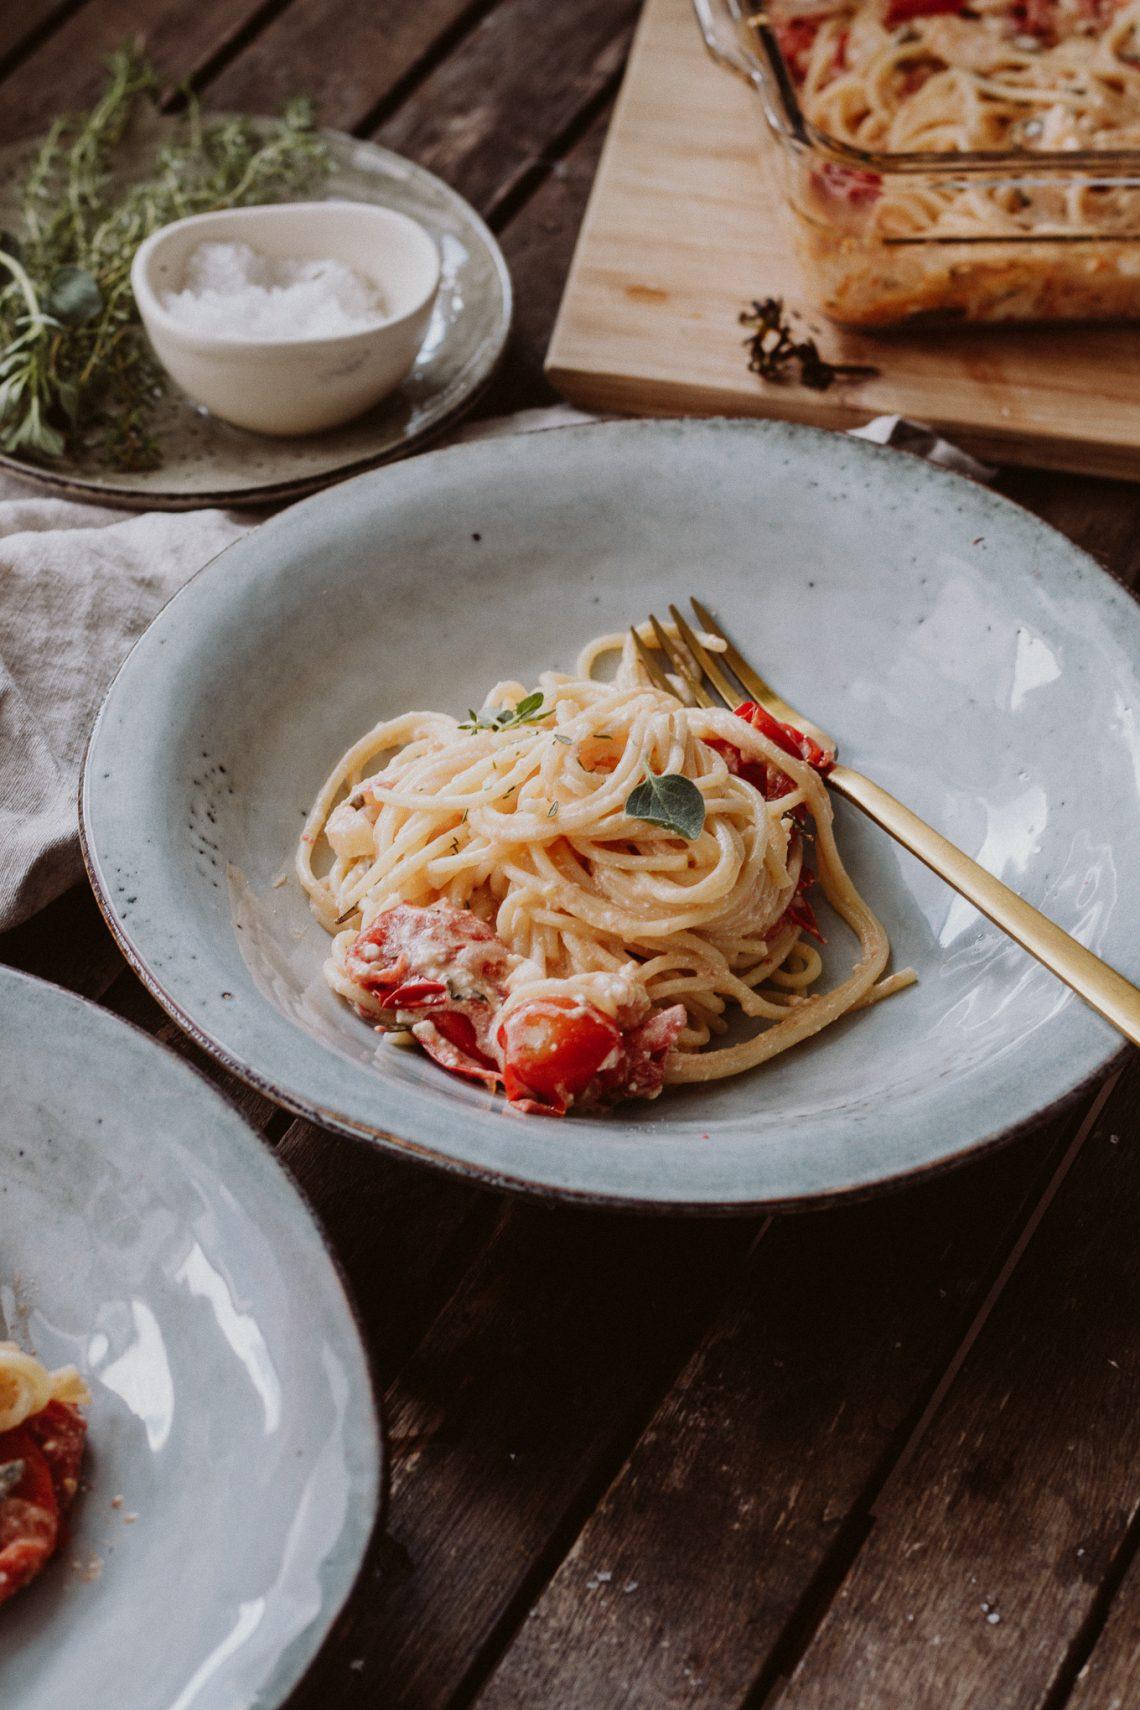 Rezept: Spaghetti mit Tomaten-Feta-Soße aus dem Ofen